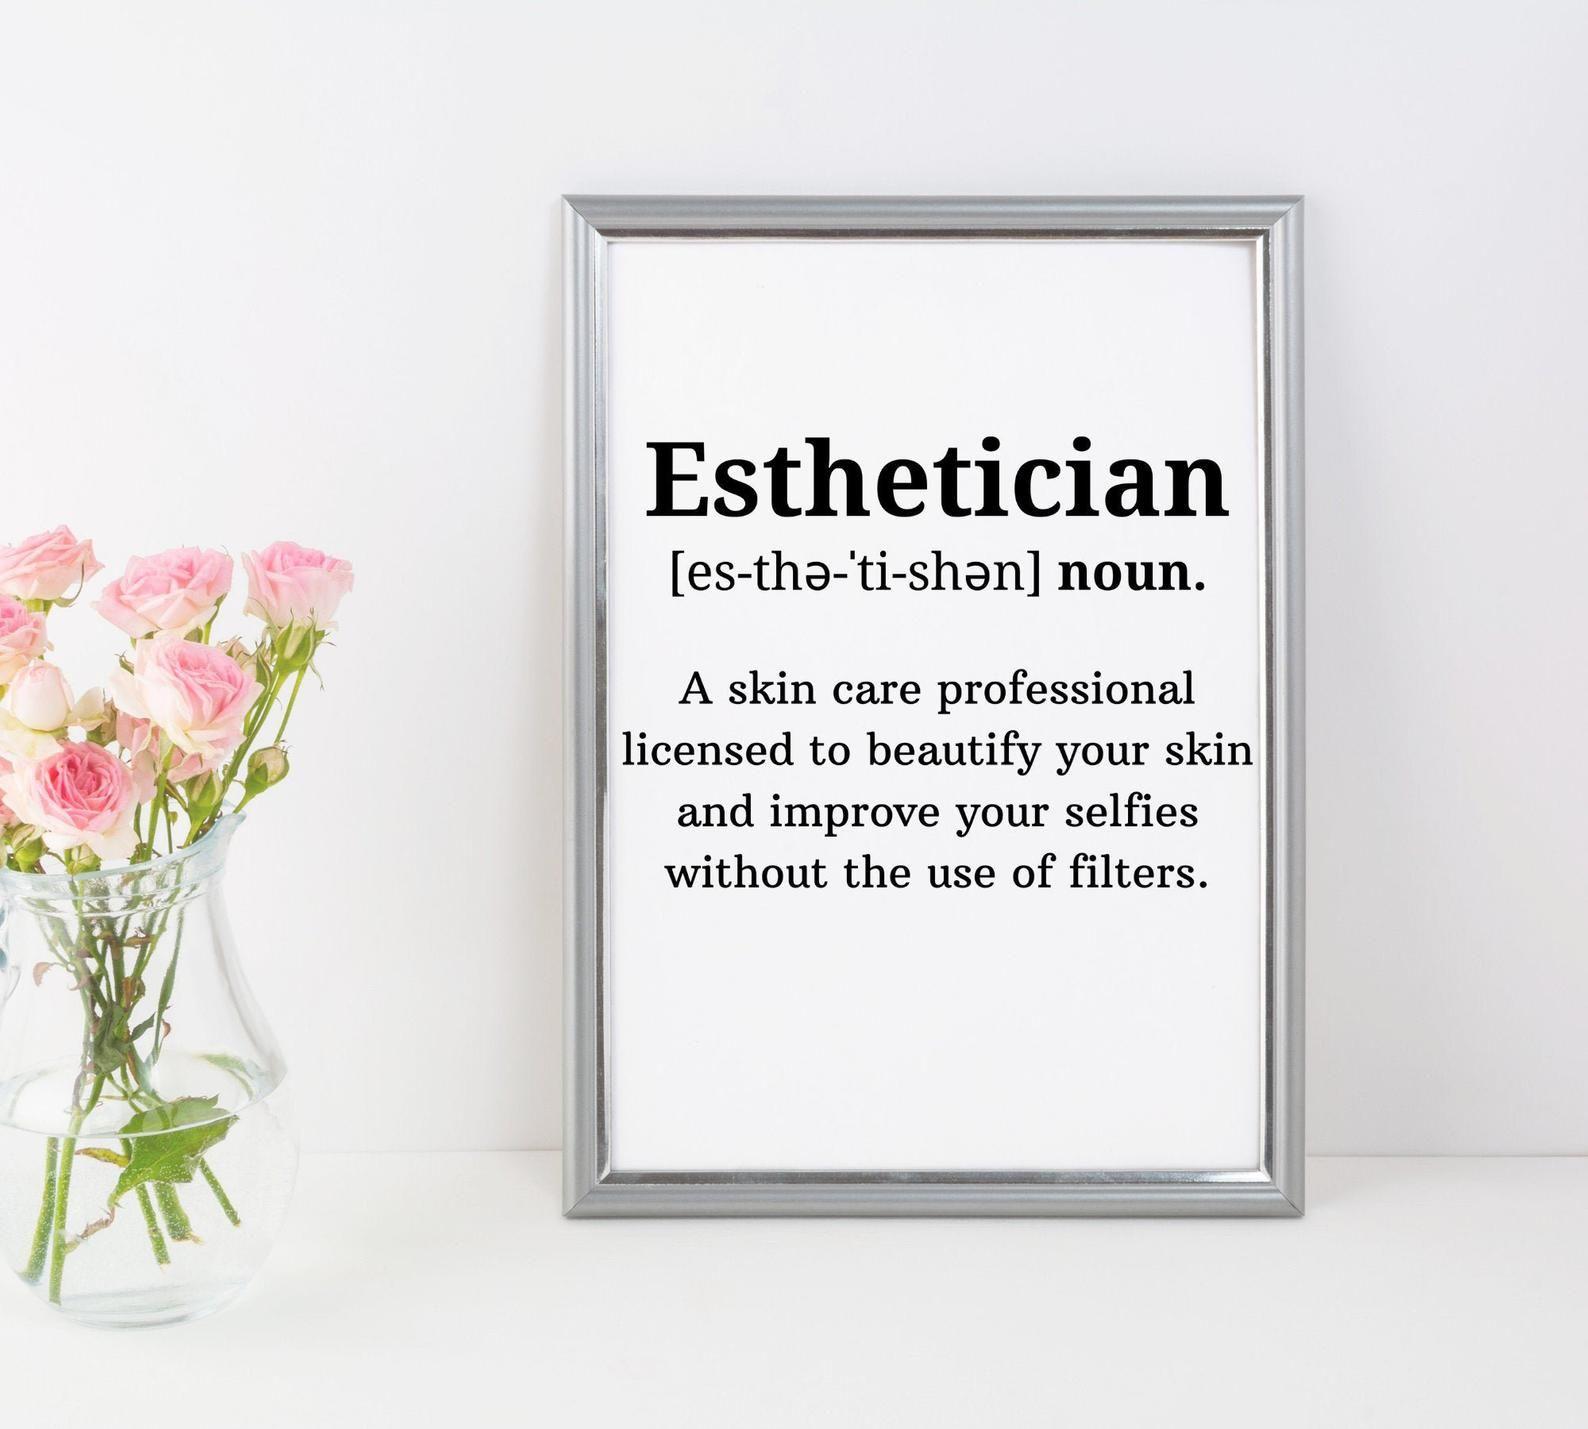 Esthetician Definition Print - Salon Decor Print, Esthetician Decor, Beauty Salon Decor, Printable Hair Salon Decor, Spa Décor